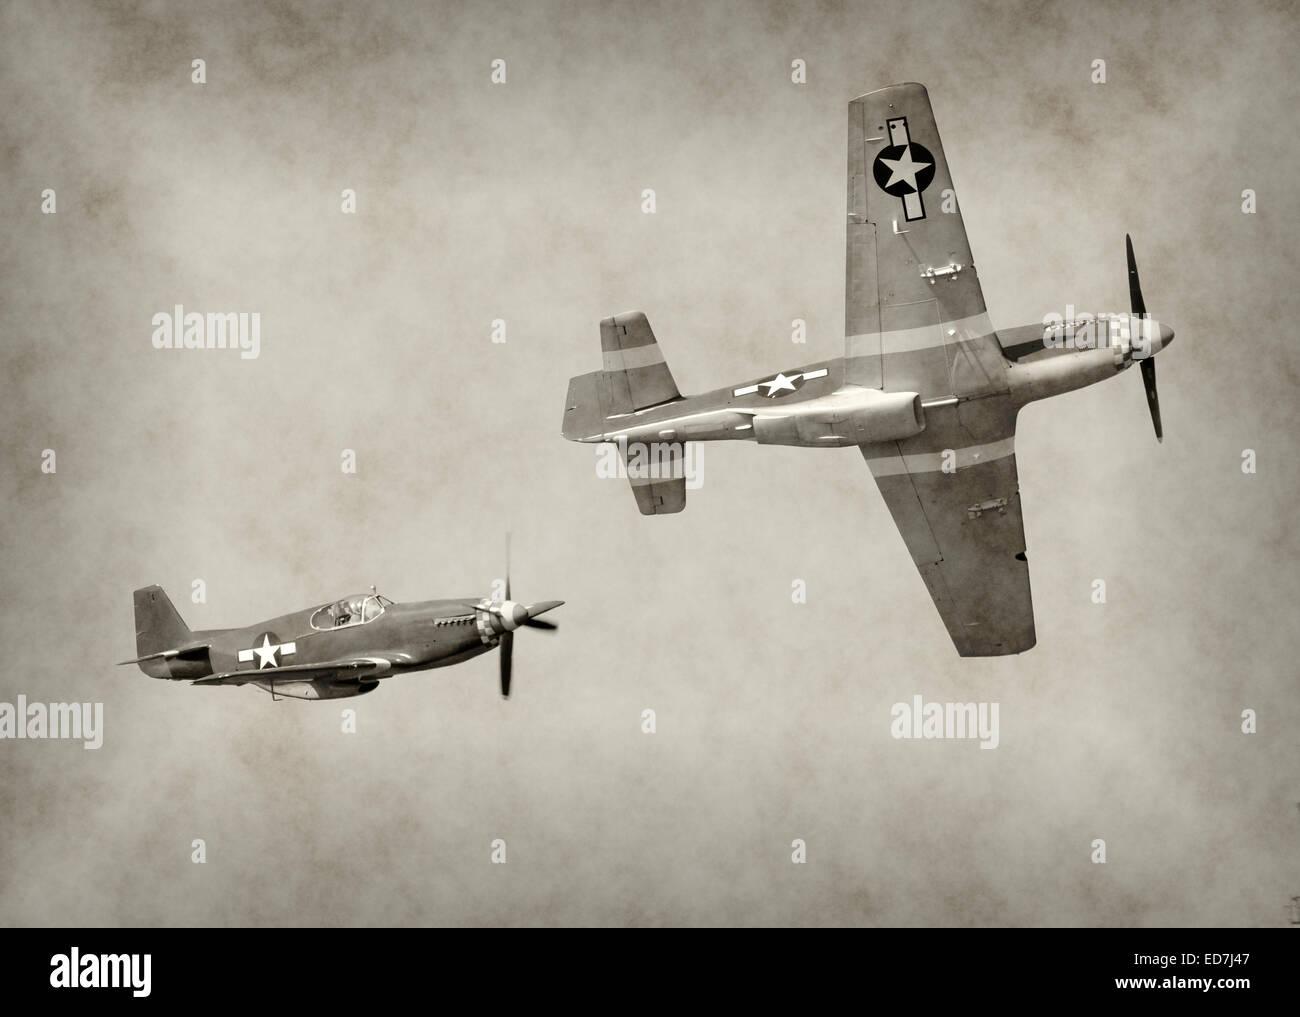 World War II fighter airplanes in flight - Stock Image